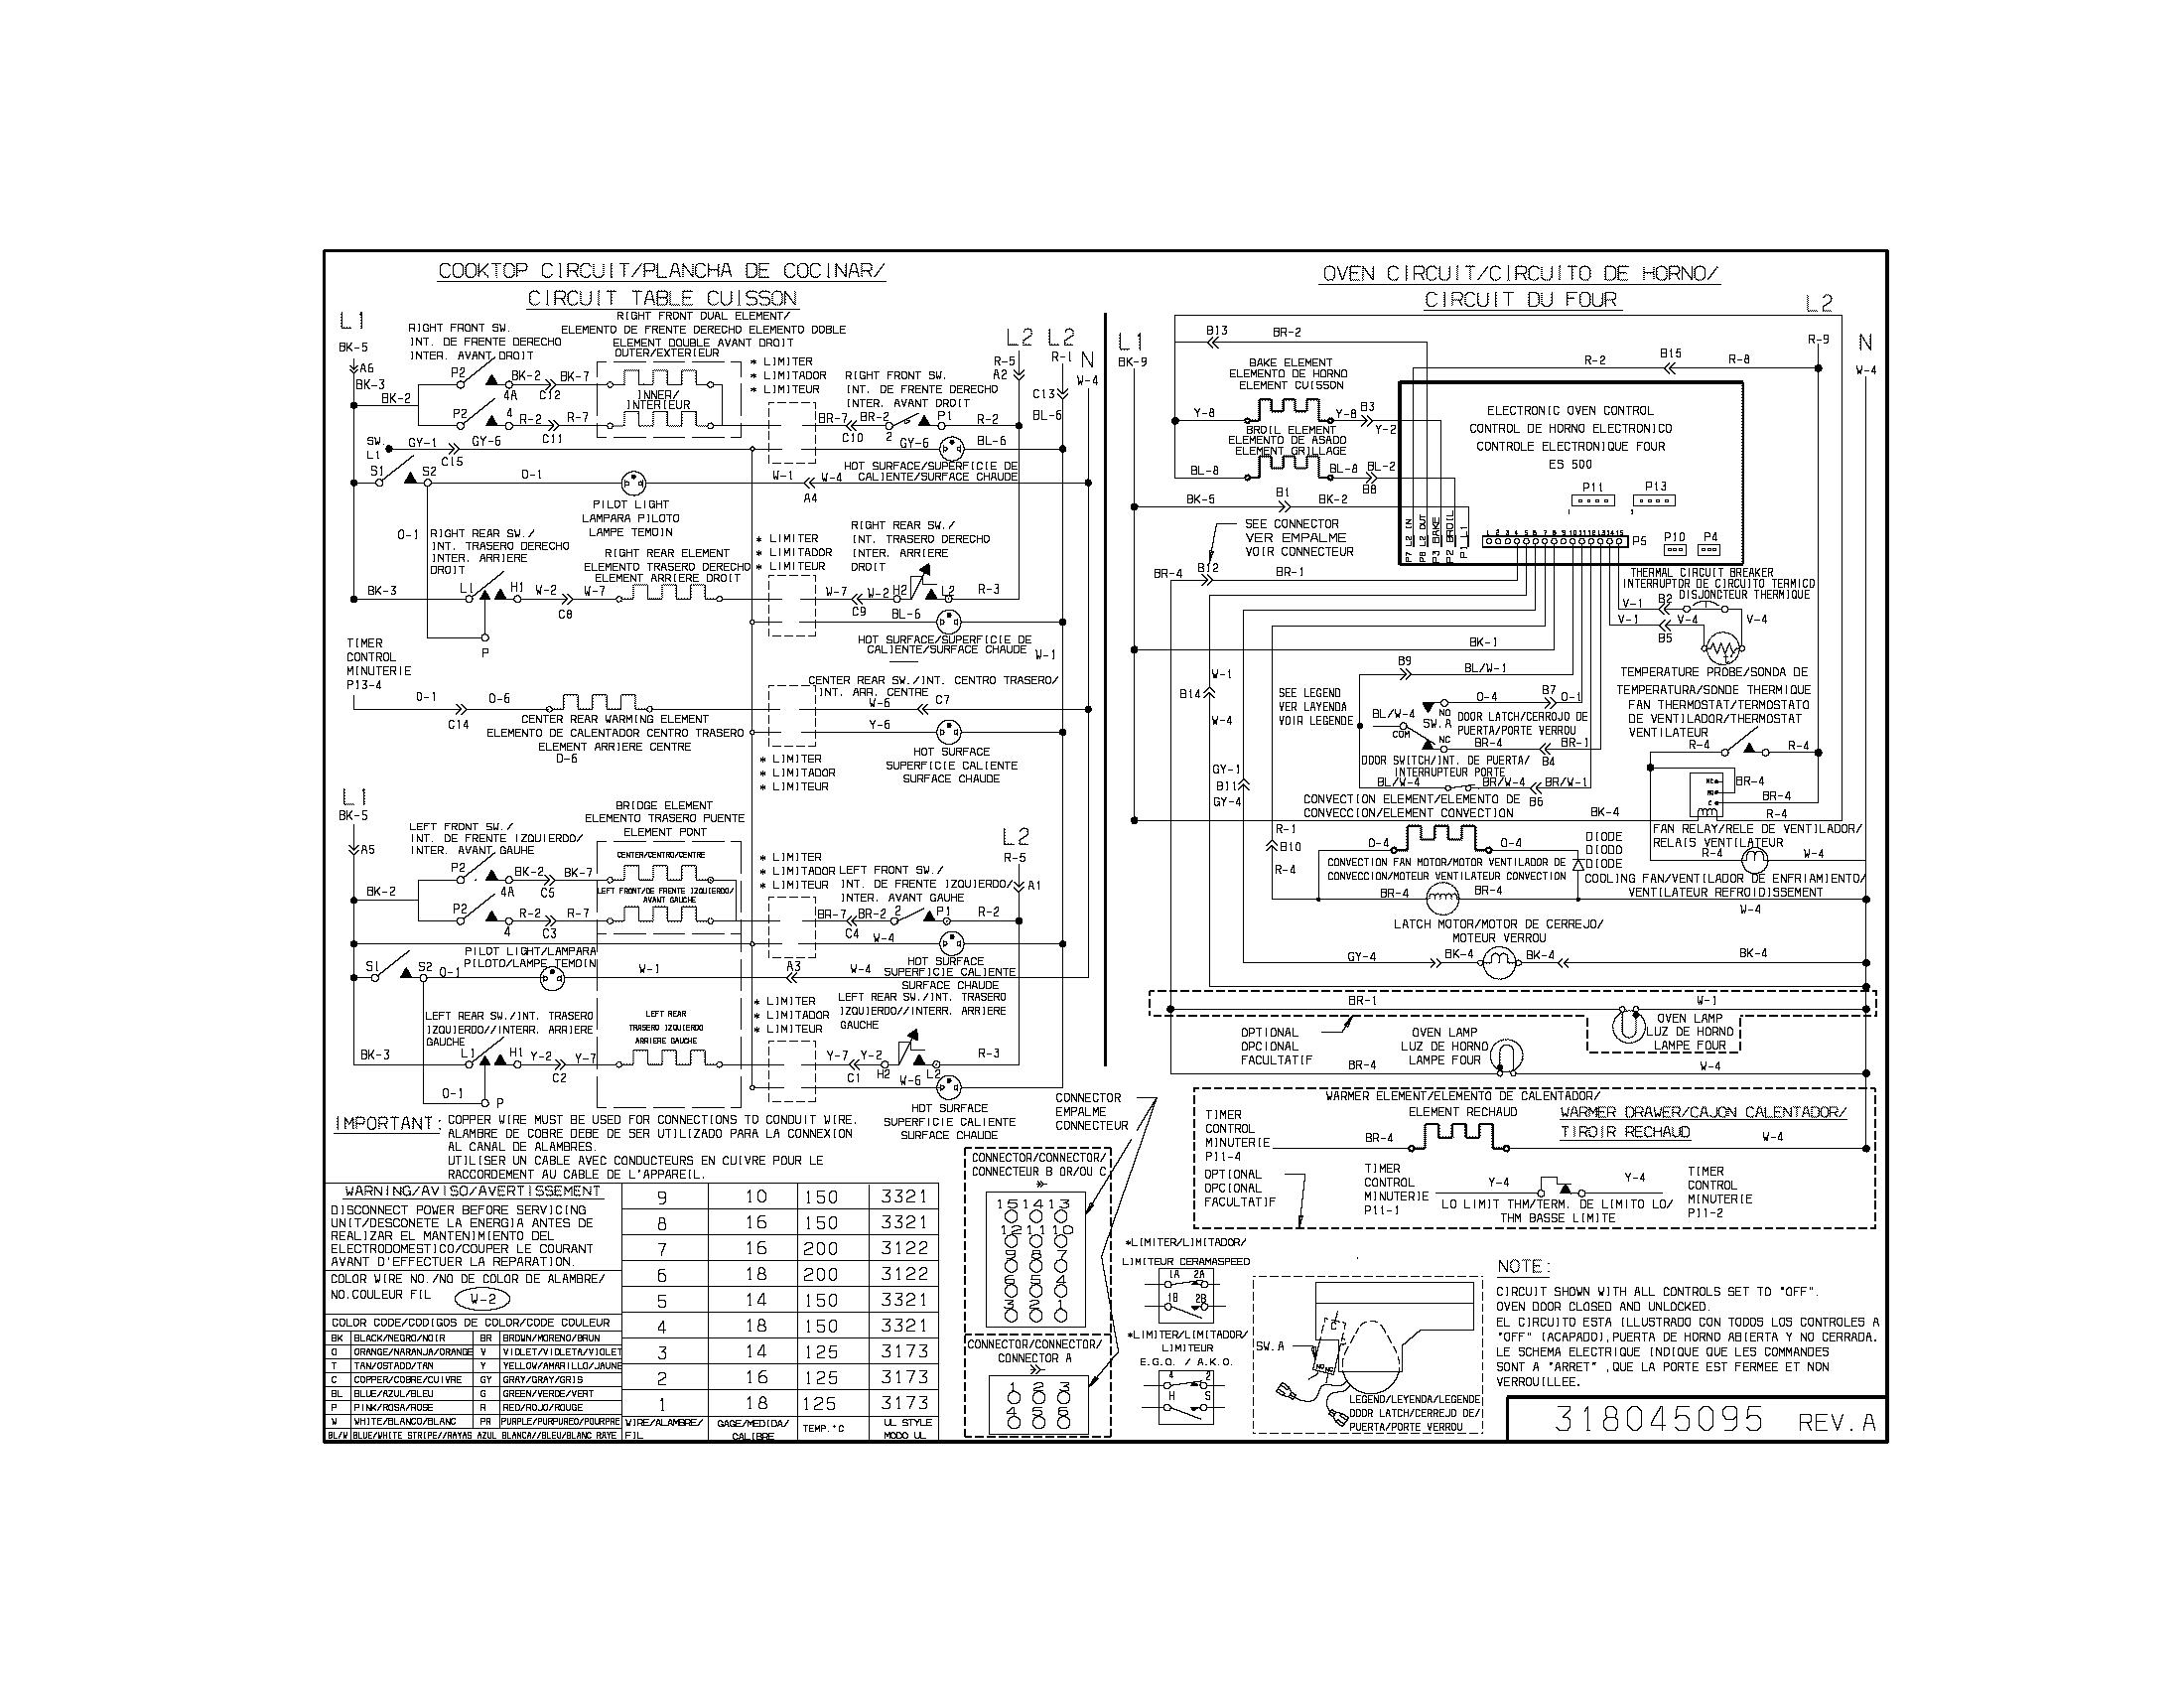 frigidaire cpes389cc1 range timer stove clocks and appliance timerscpes389cc1 range wiring diagram parts diagram